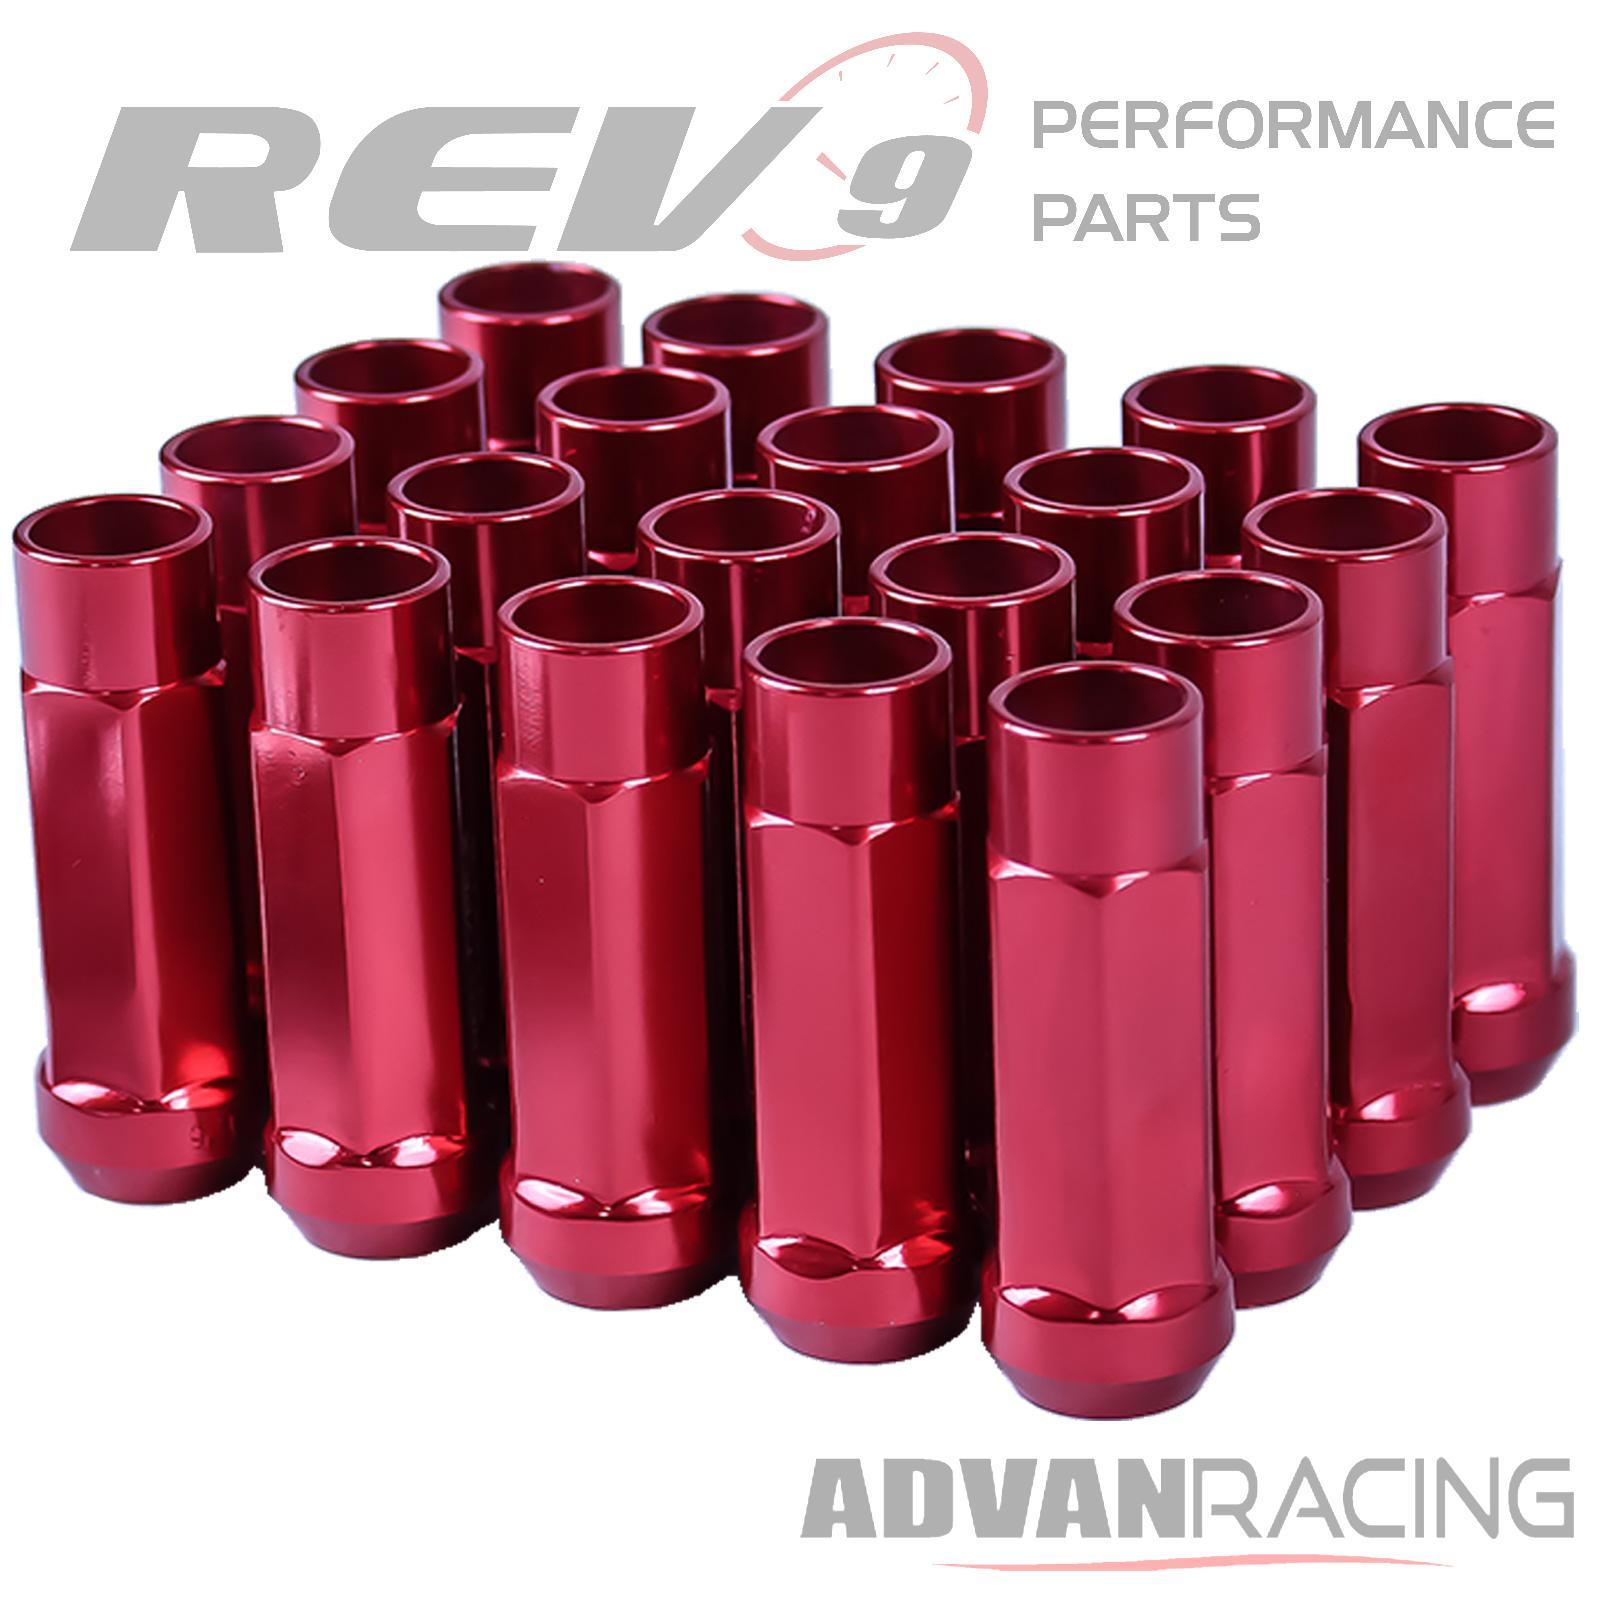 Godspeed 60mm Red Type-X Aluminum Open Lug Nuts 20pcs